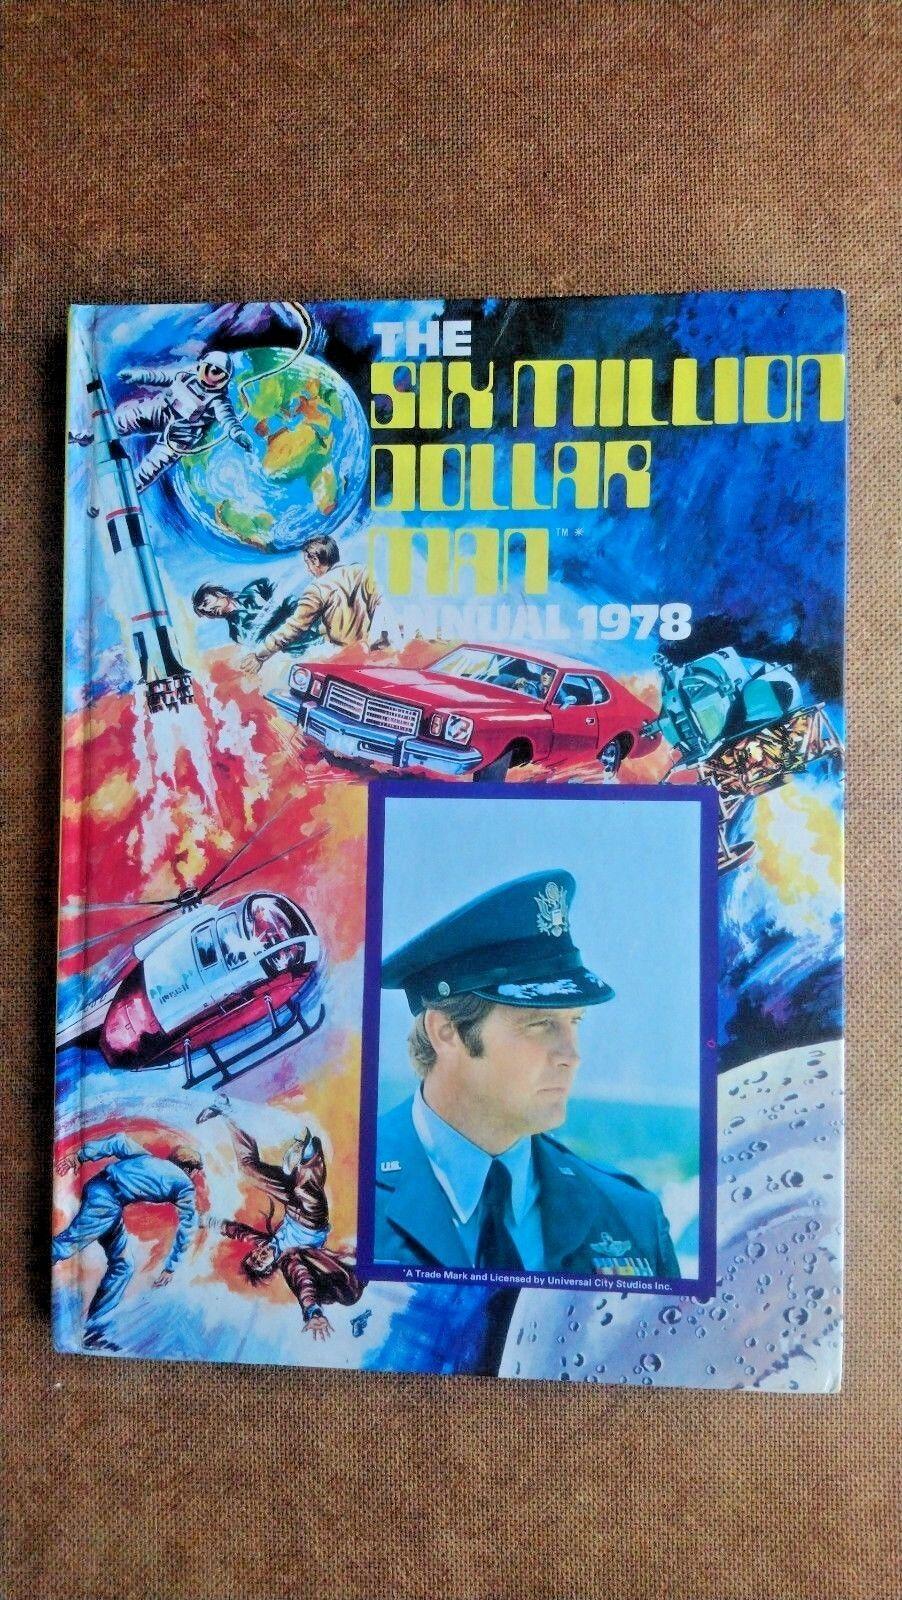 Six Million Dollar Man Annual 1978